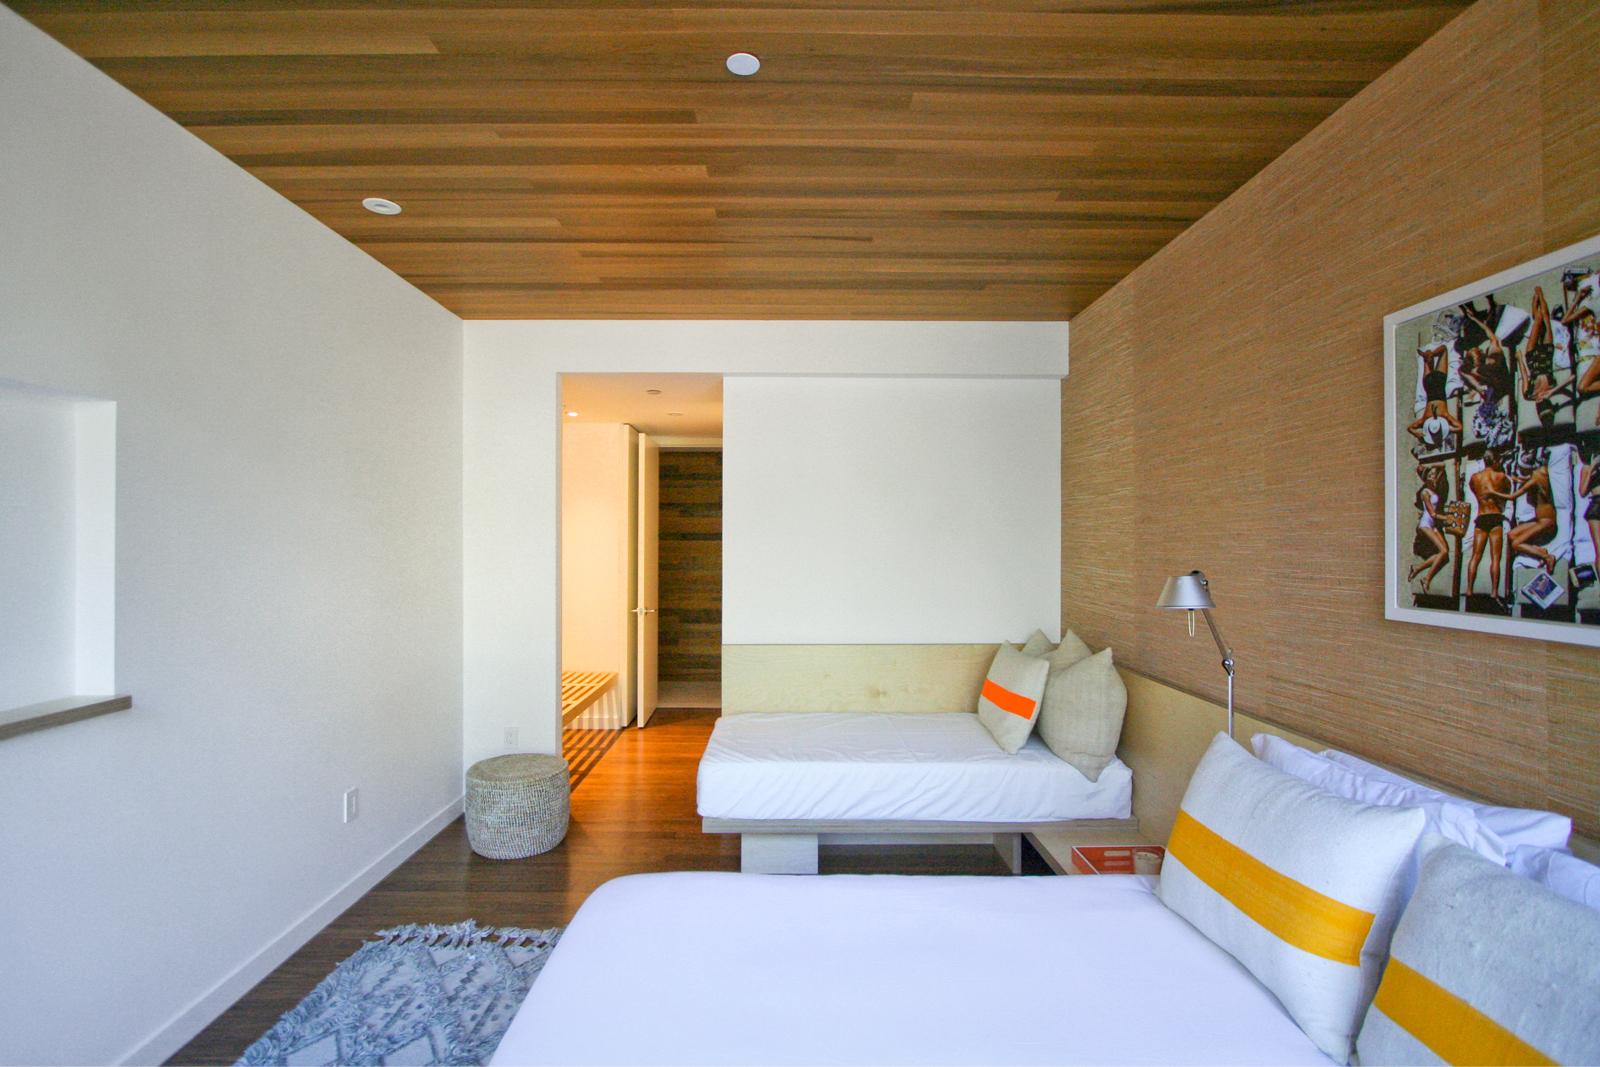 res4-resolution-4-architecture-modern-modular-house-prefab-amagansett-addition-bedroom-perspective-02.jpg